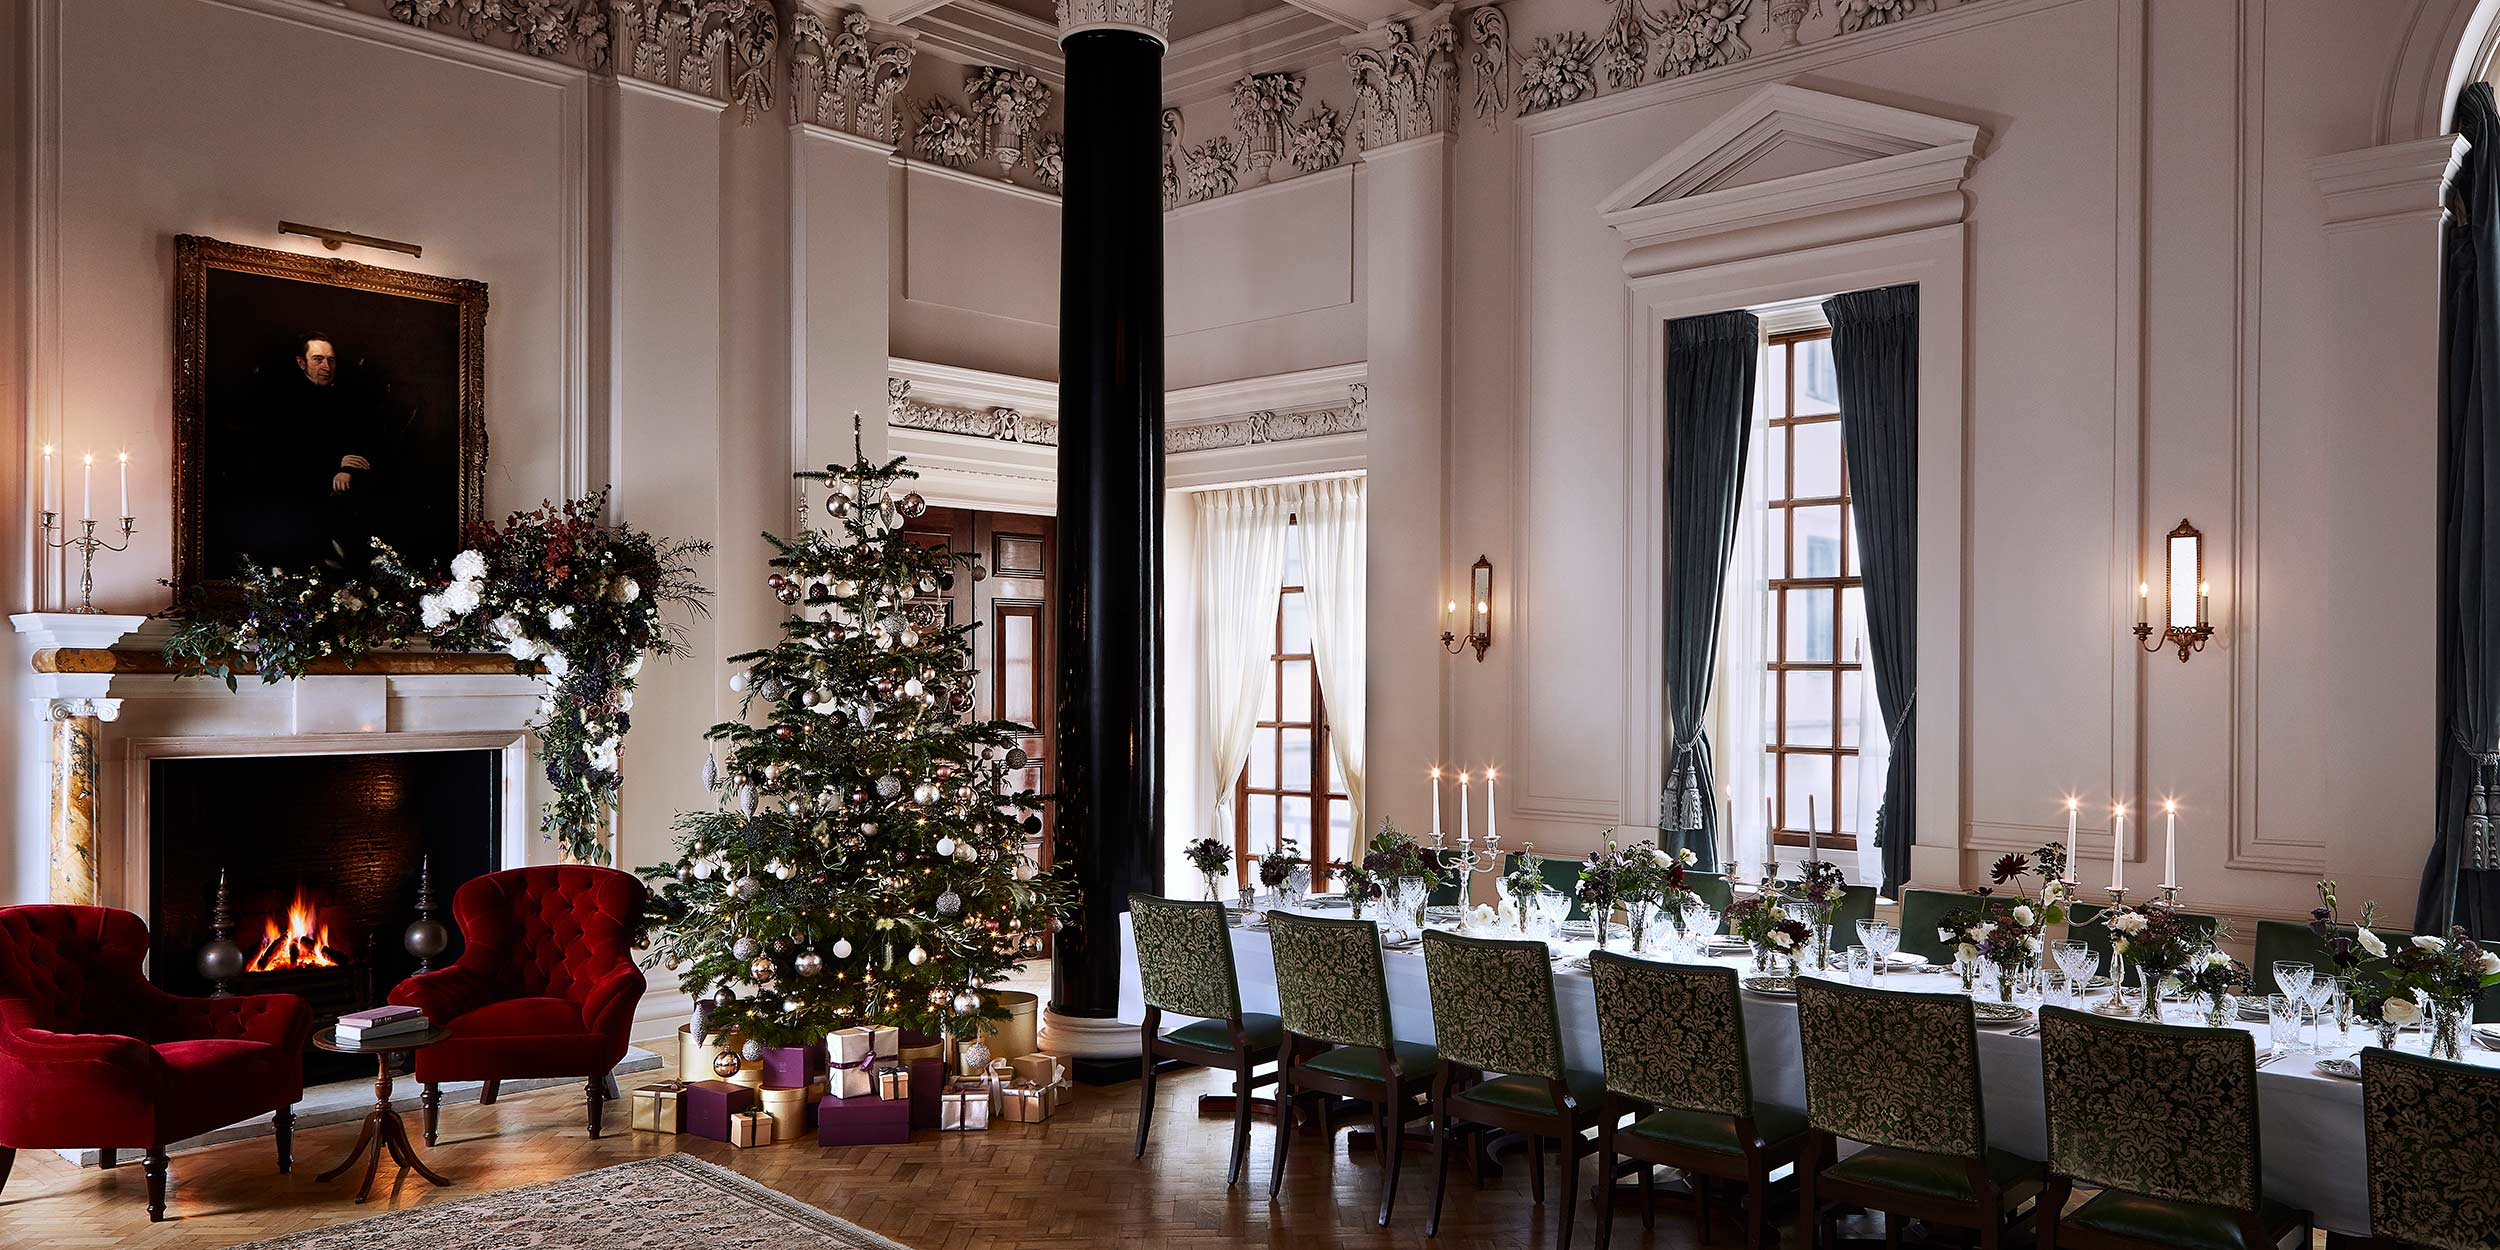 General-Christmas-Dining-01-final-version.jpg